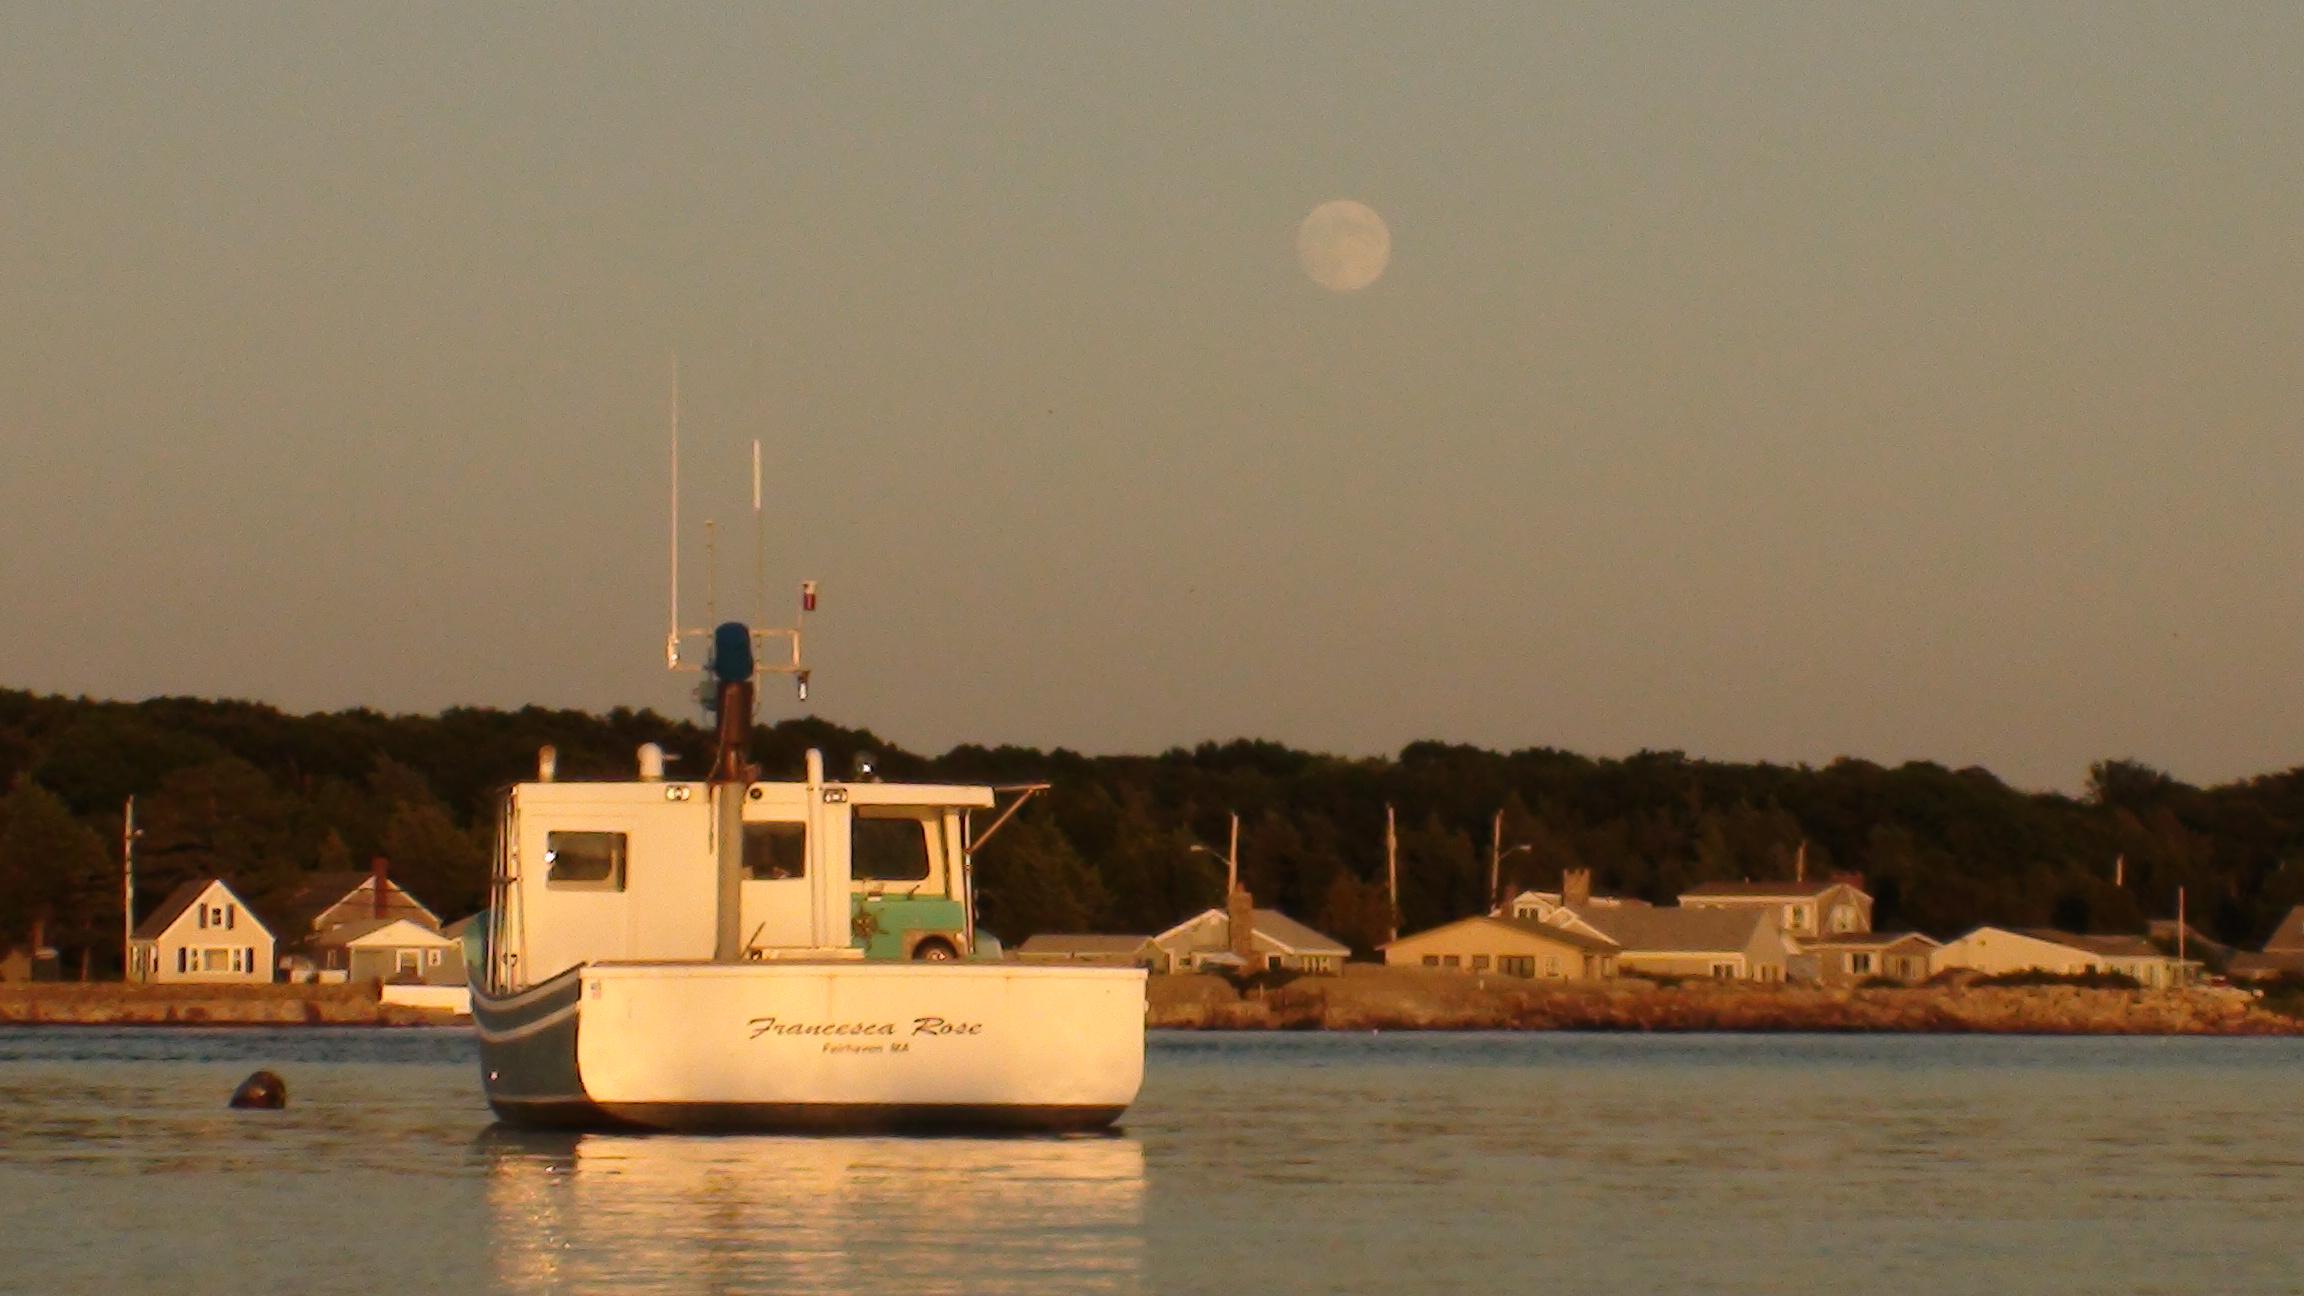 Moonrise August 12, 2011 658PM